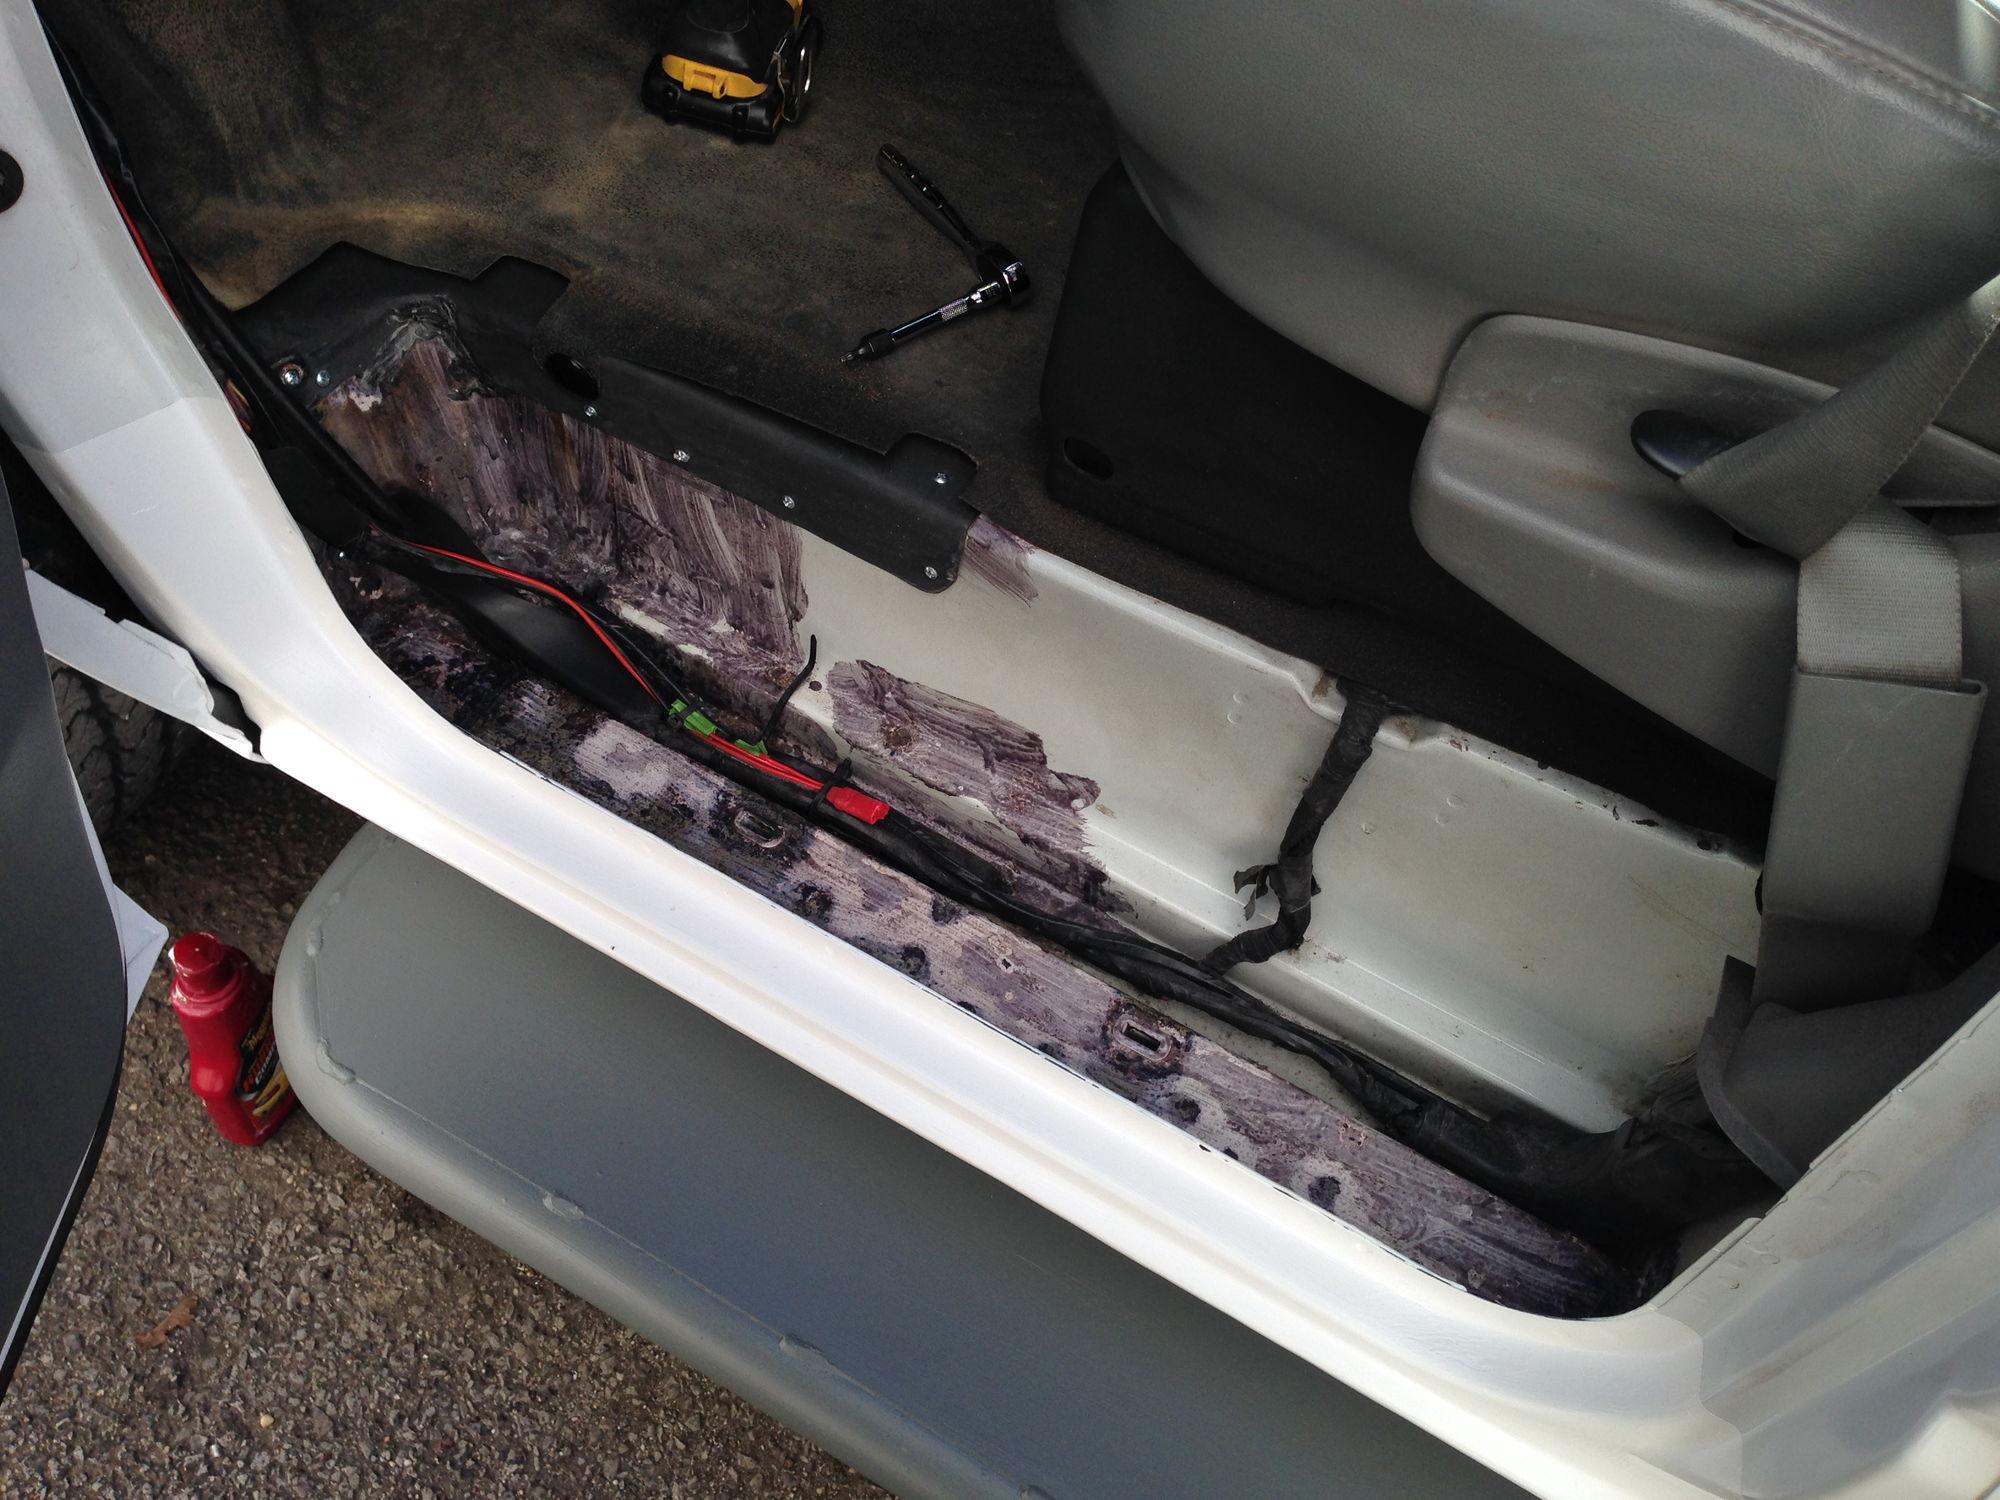 how to stop rust under truck